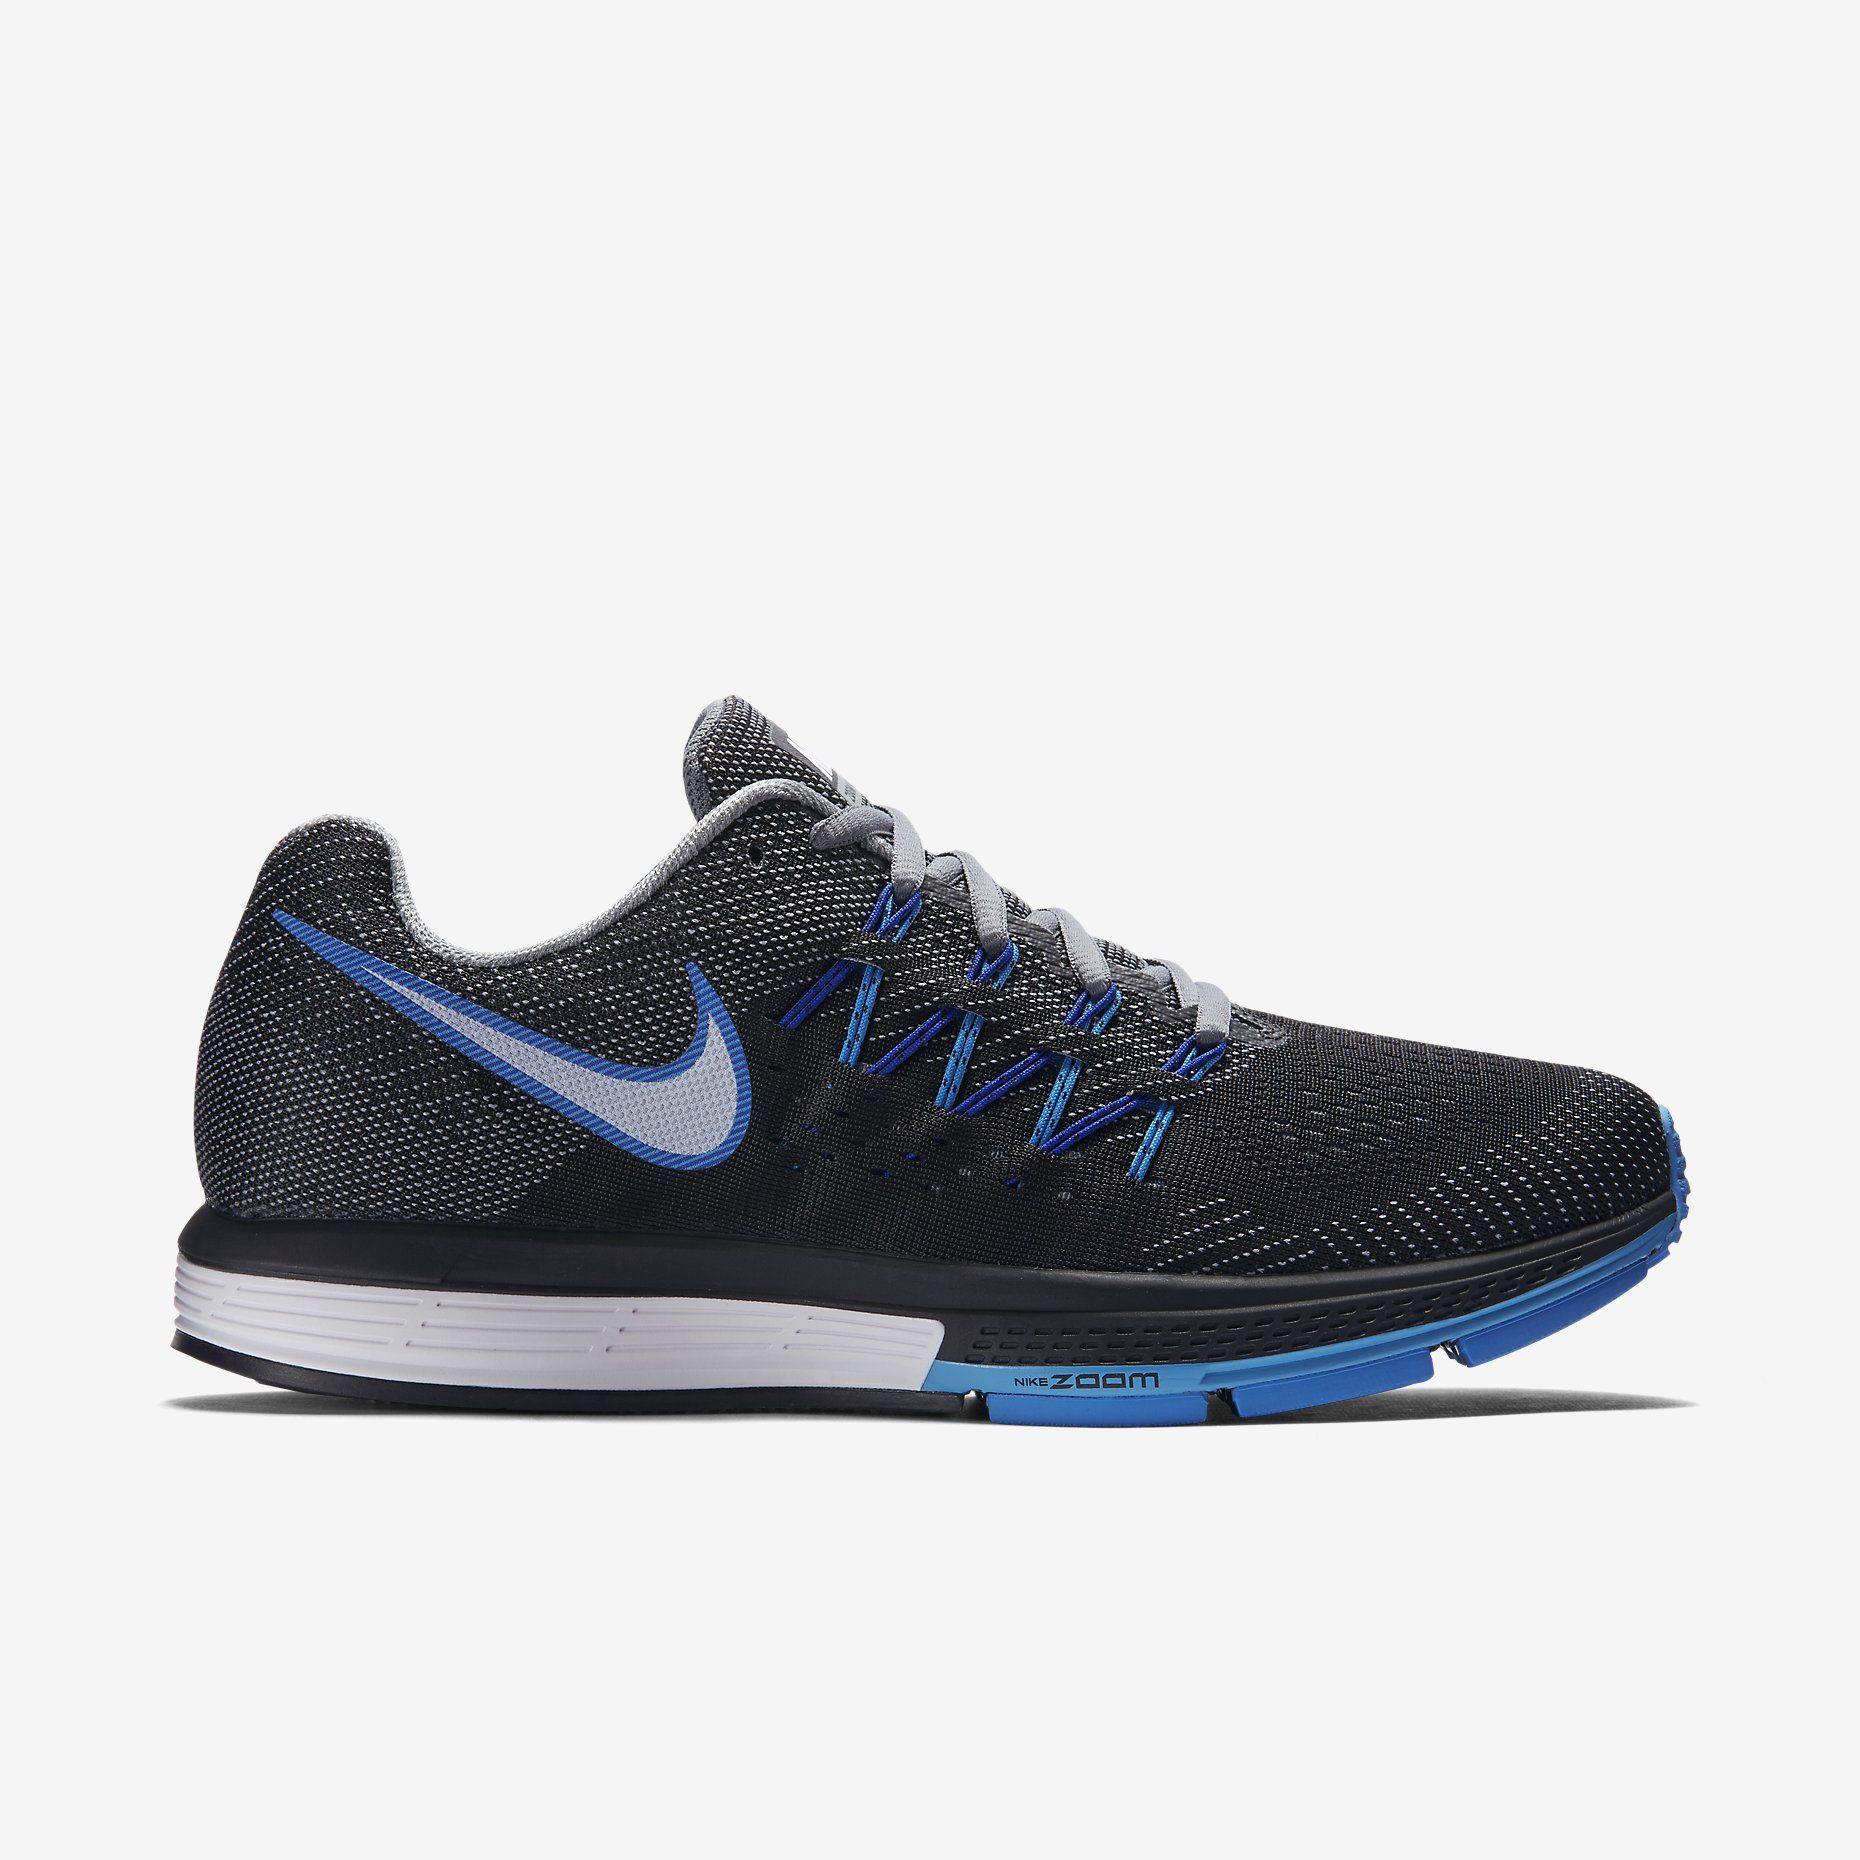 222e2195cbaf6 Nike Air Pegasus+ 30 Prize Blue Dark Armour Blue Blue Hero White ...